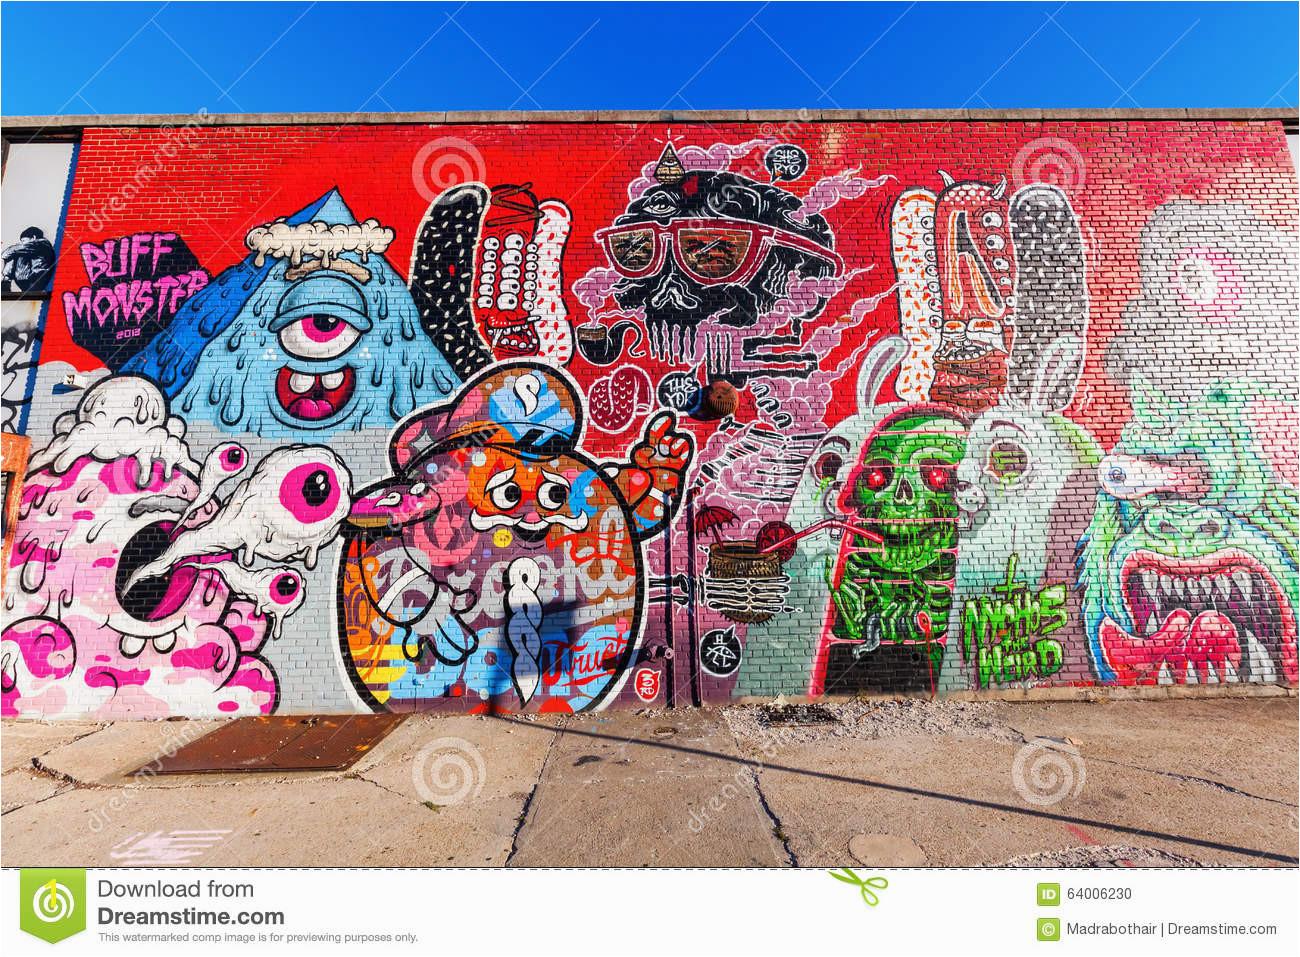 Mural art in Bushwick Brooklyn NYC